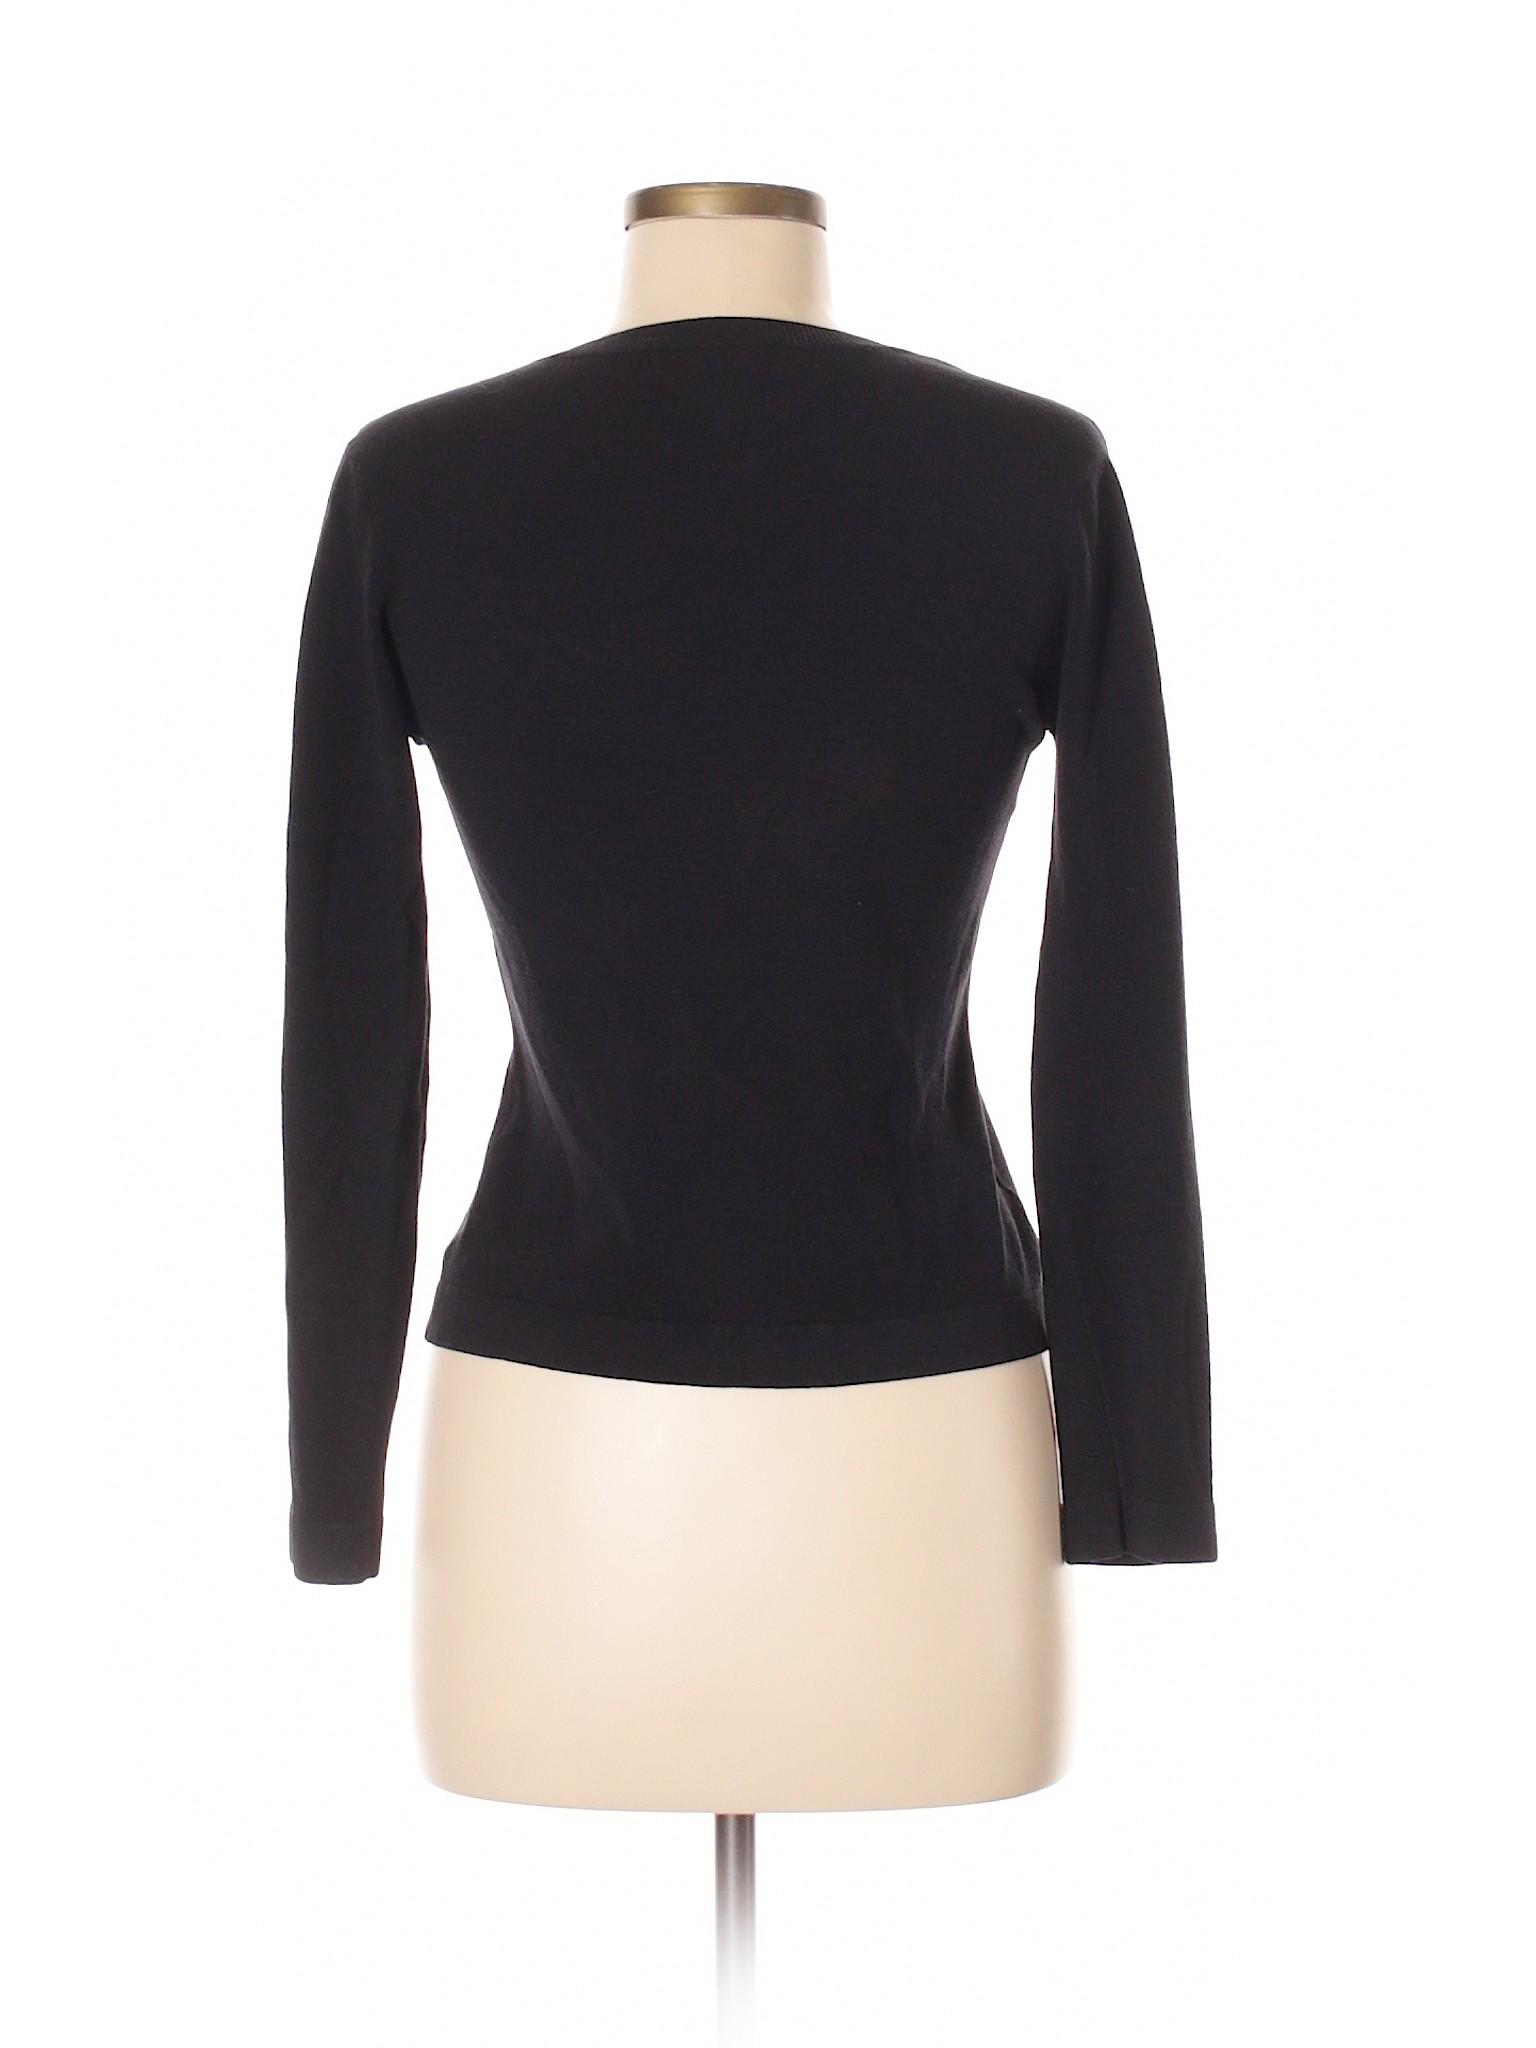 Boutique Sweater Winter Boutique Pullover Express Winter g5pxxCwqv